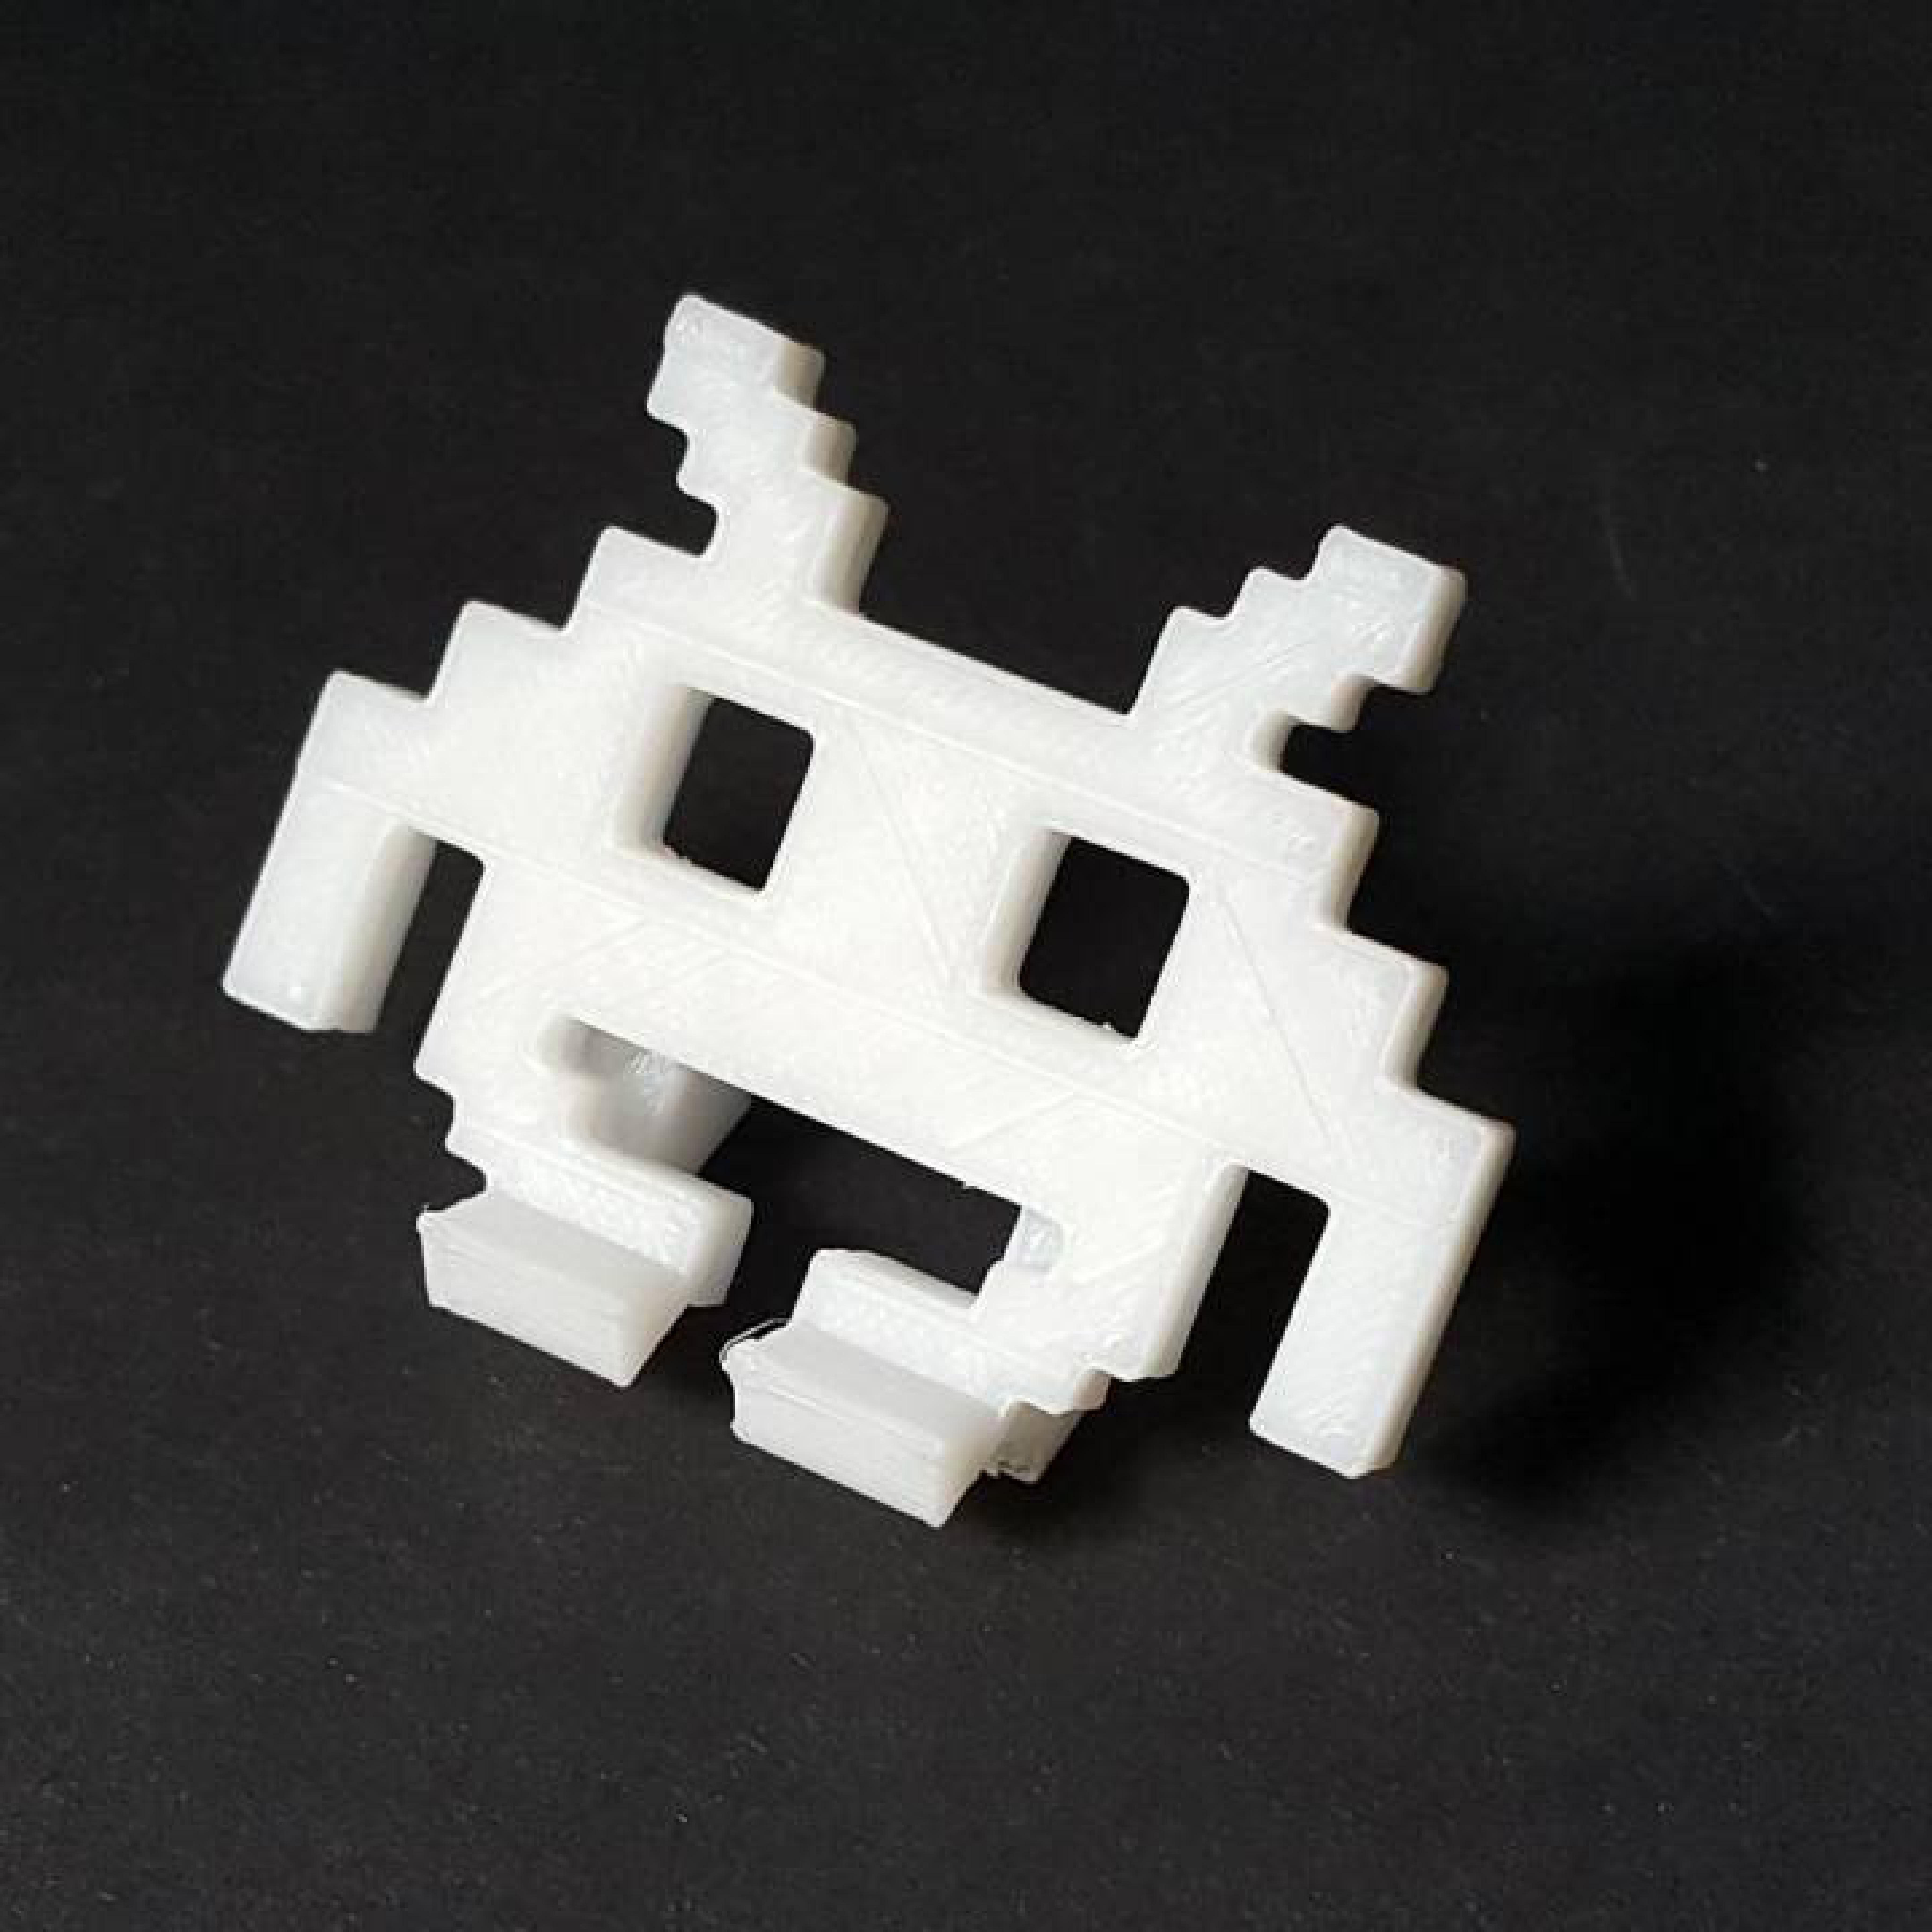 Space Invader Masaüstü Telefon Tutucu Uzay İstilacısı